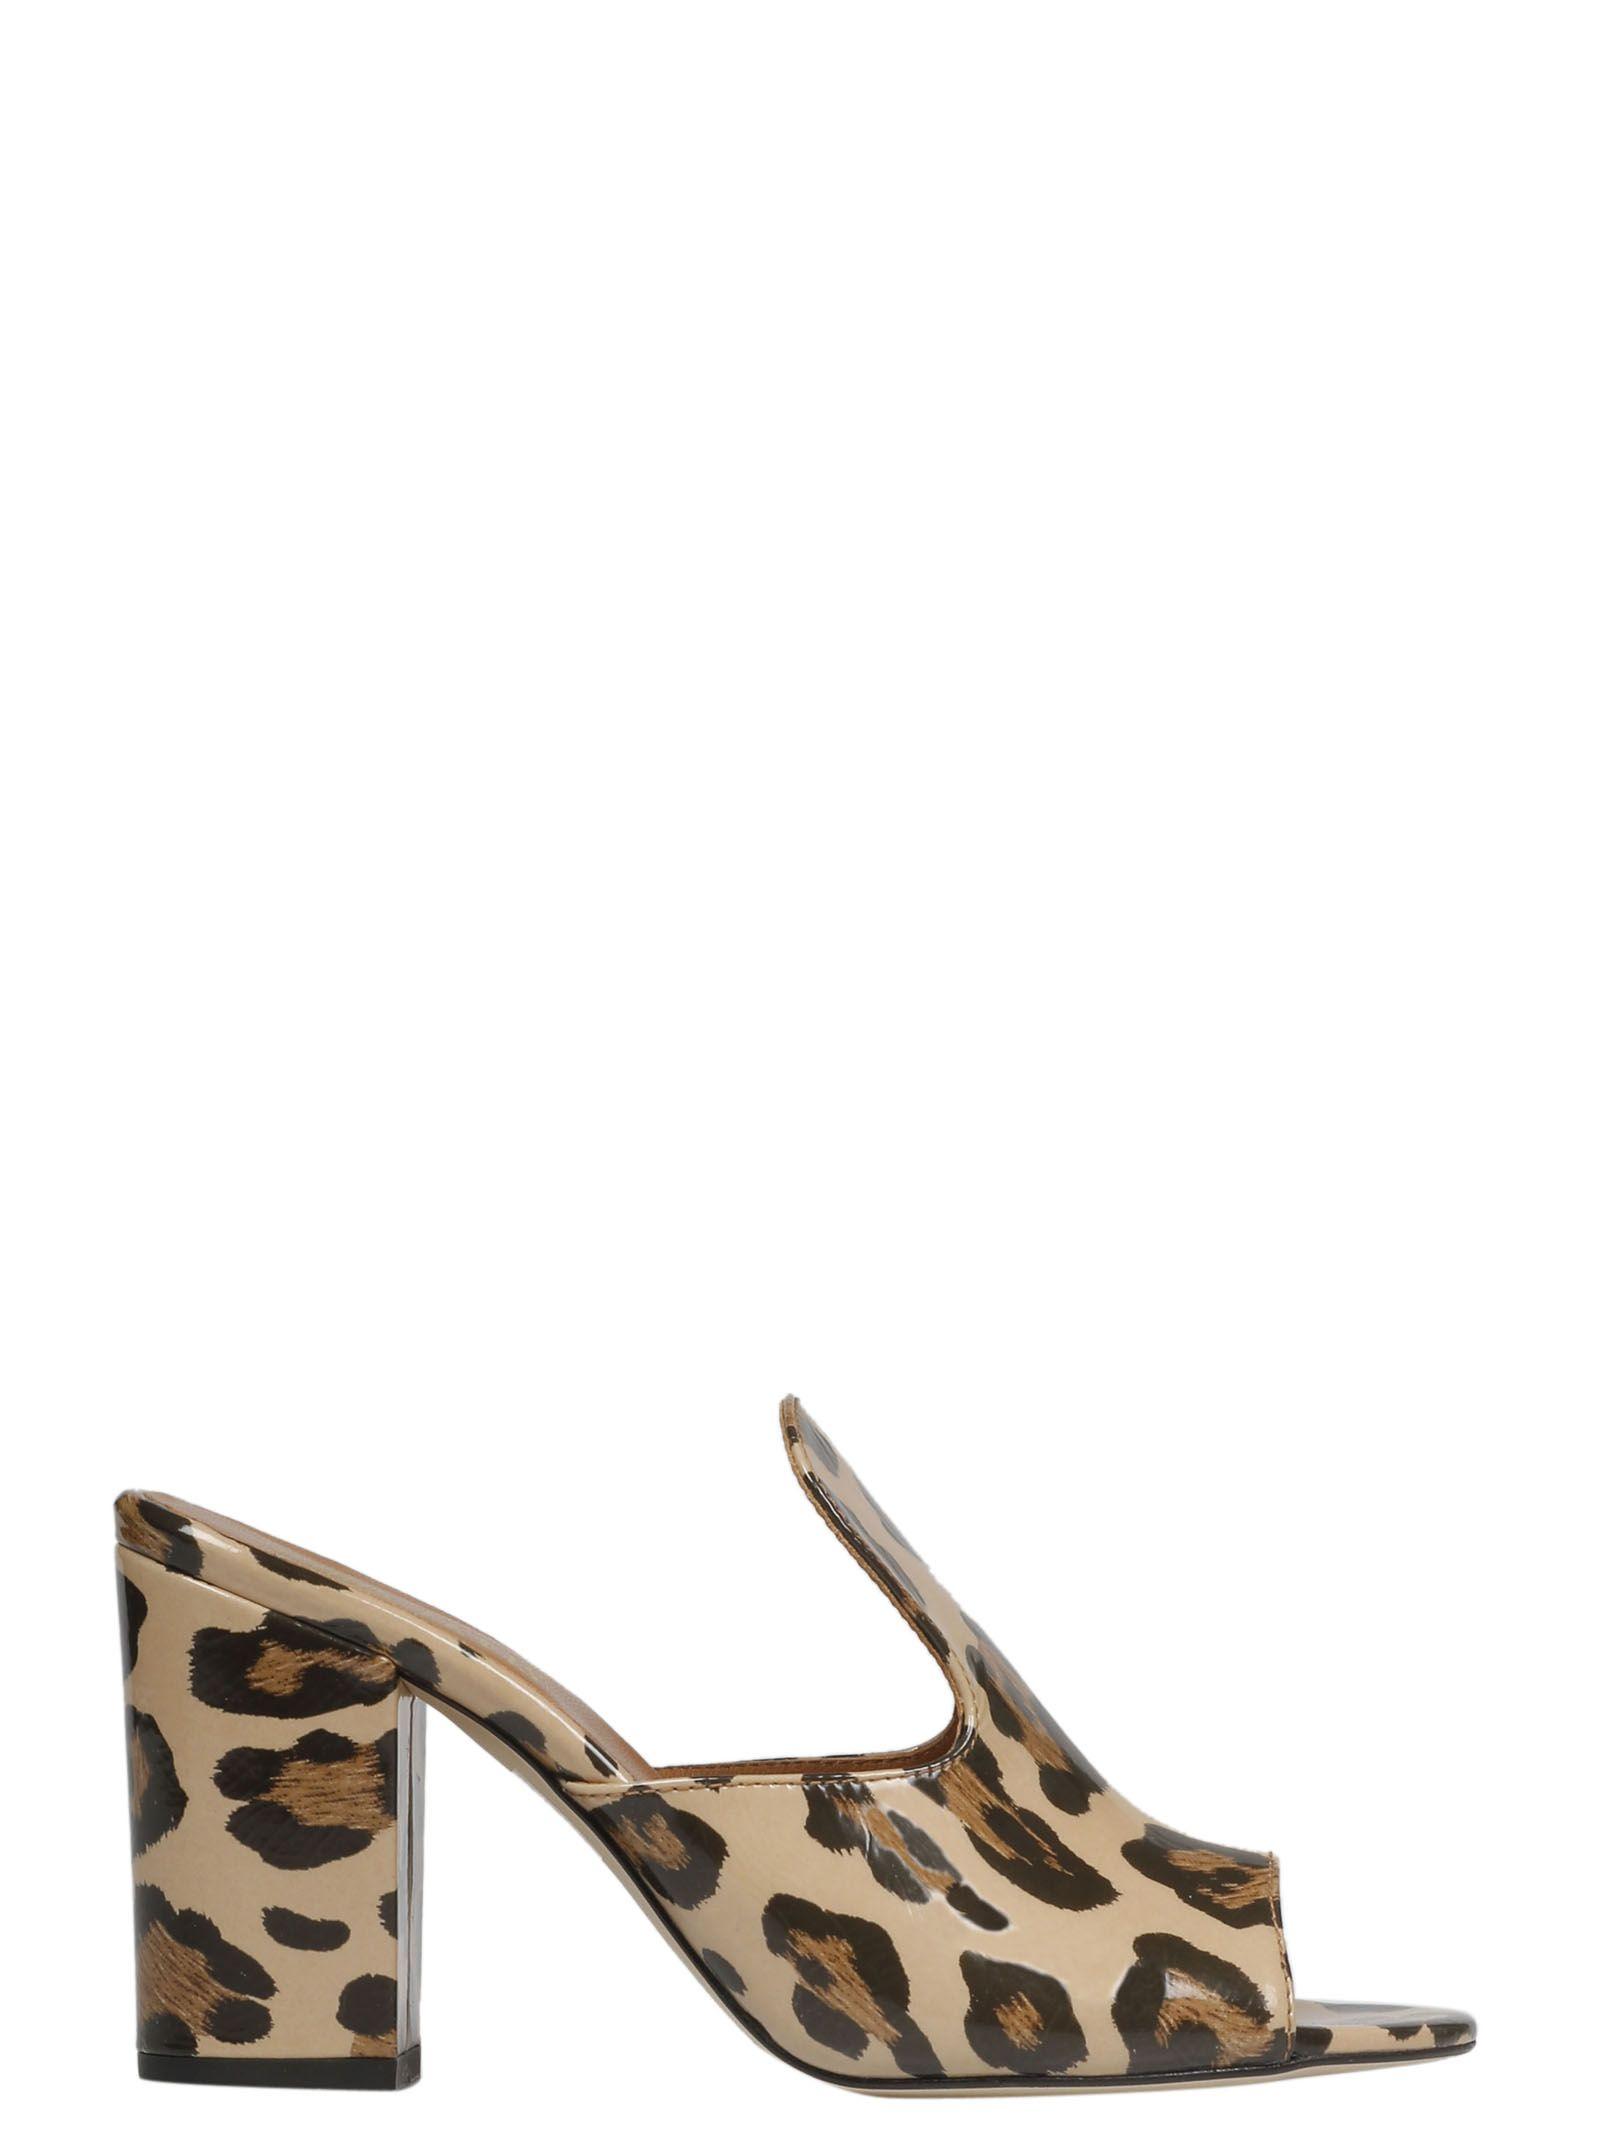 5b2c5c738a0298 Paris Texas Paris Texas Leopard Print Mules - Basic - 10837468